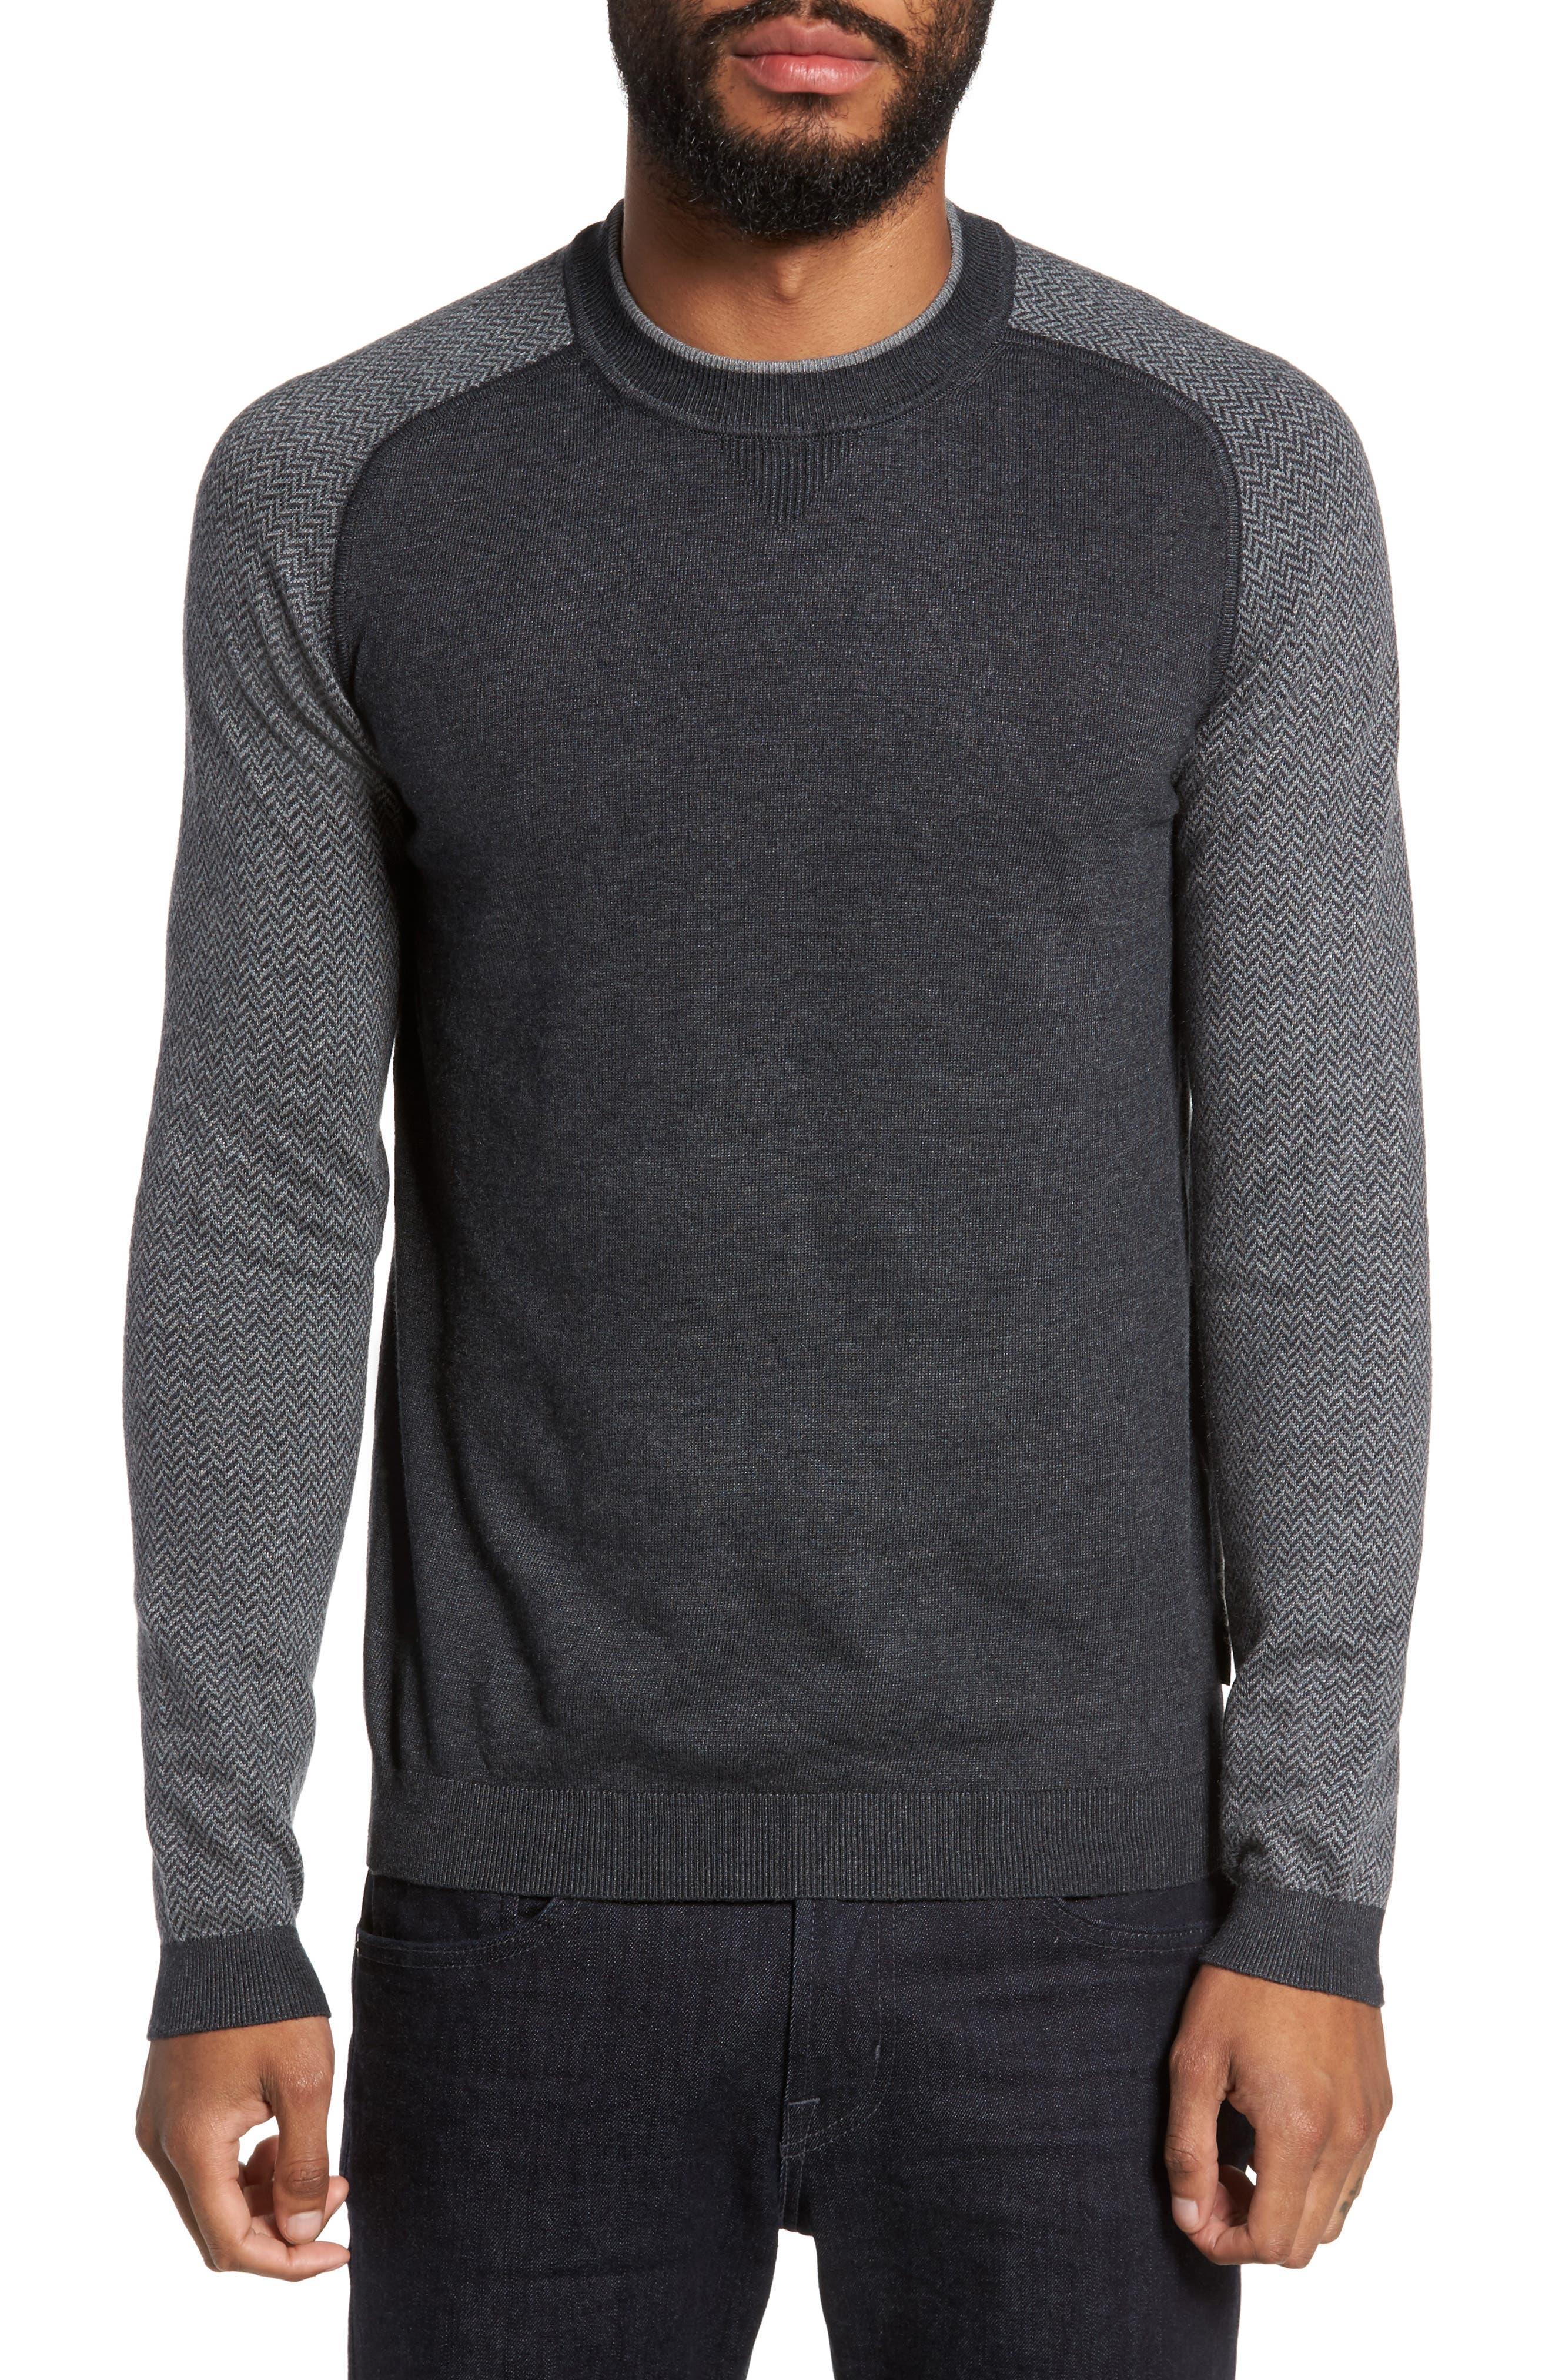 Main Image - Ted Baker London Pepmint Herringbone Sleeve Sweatshirt